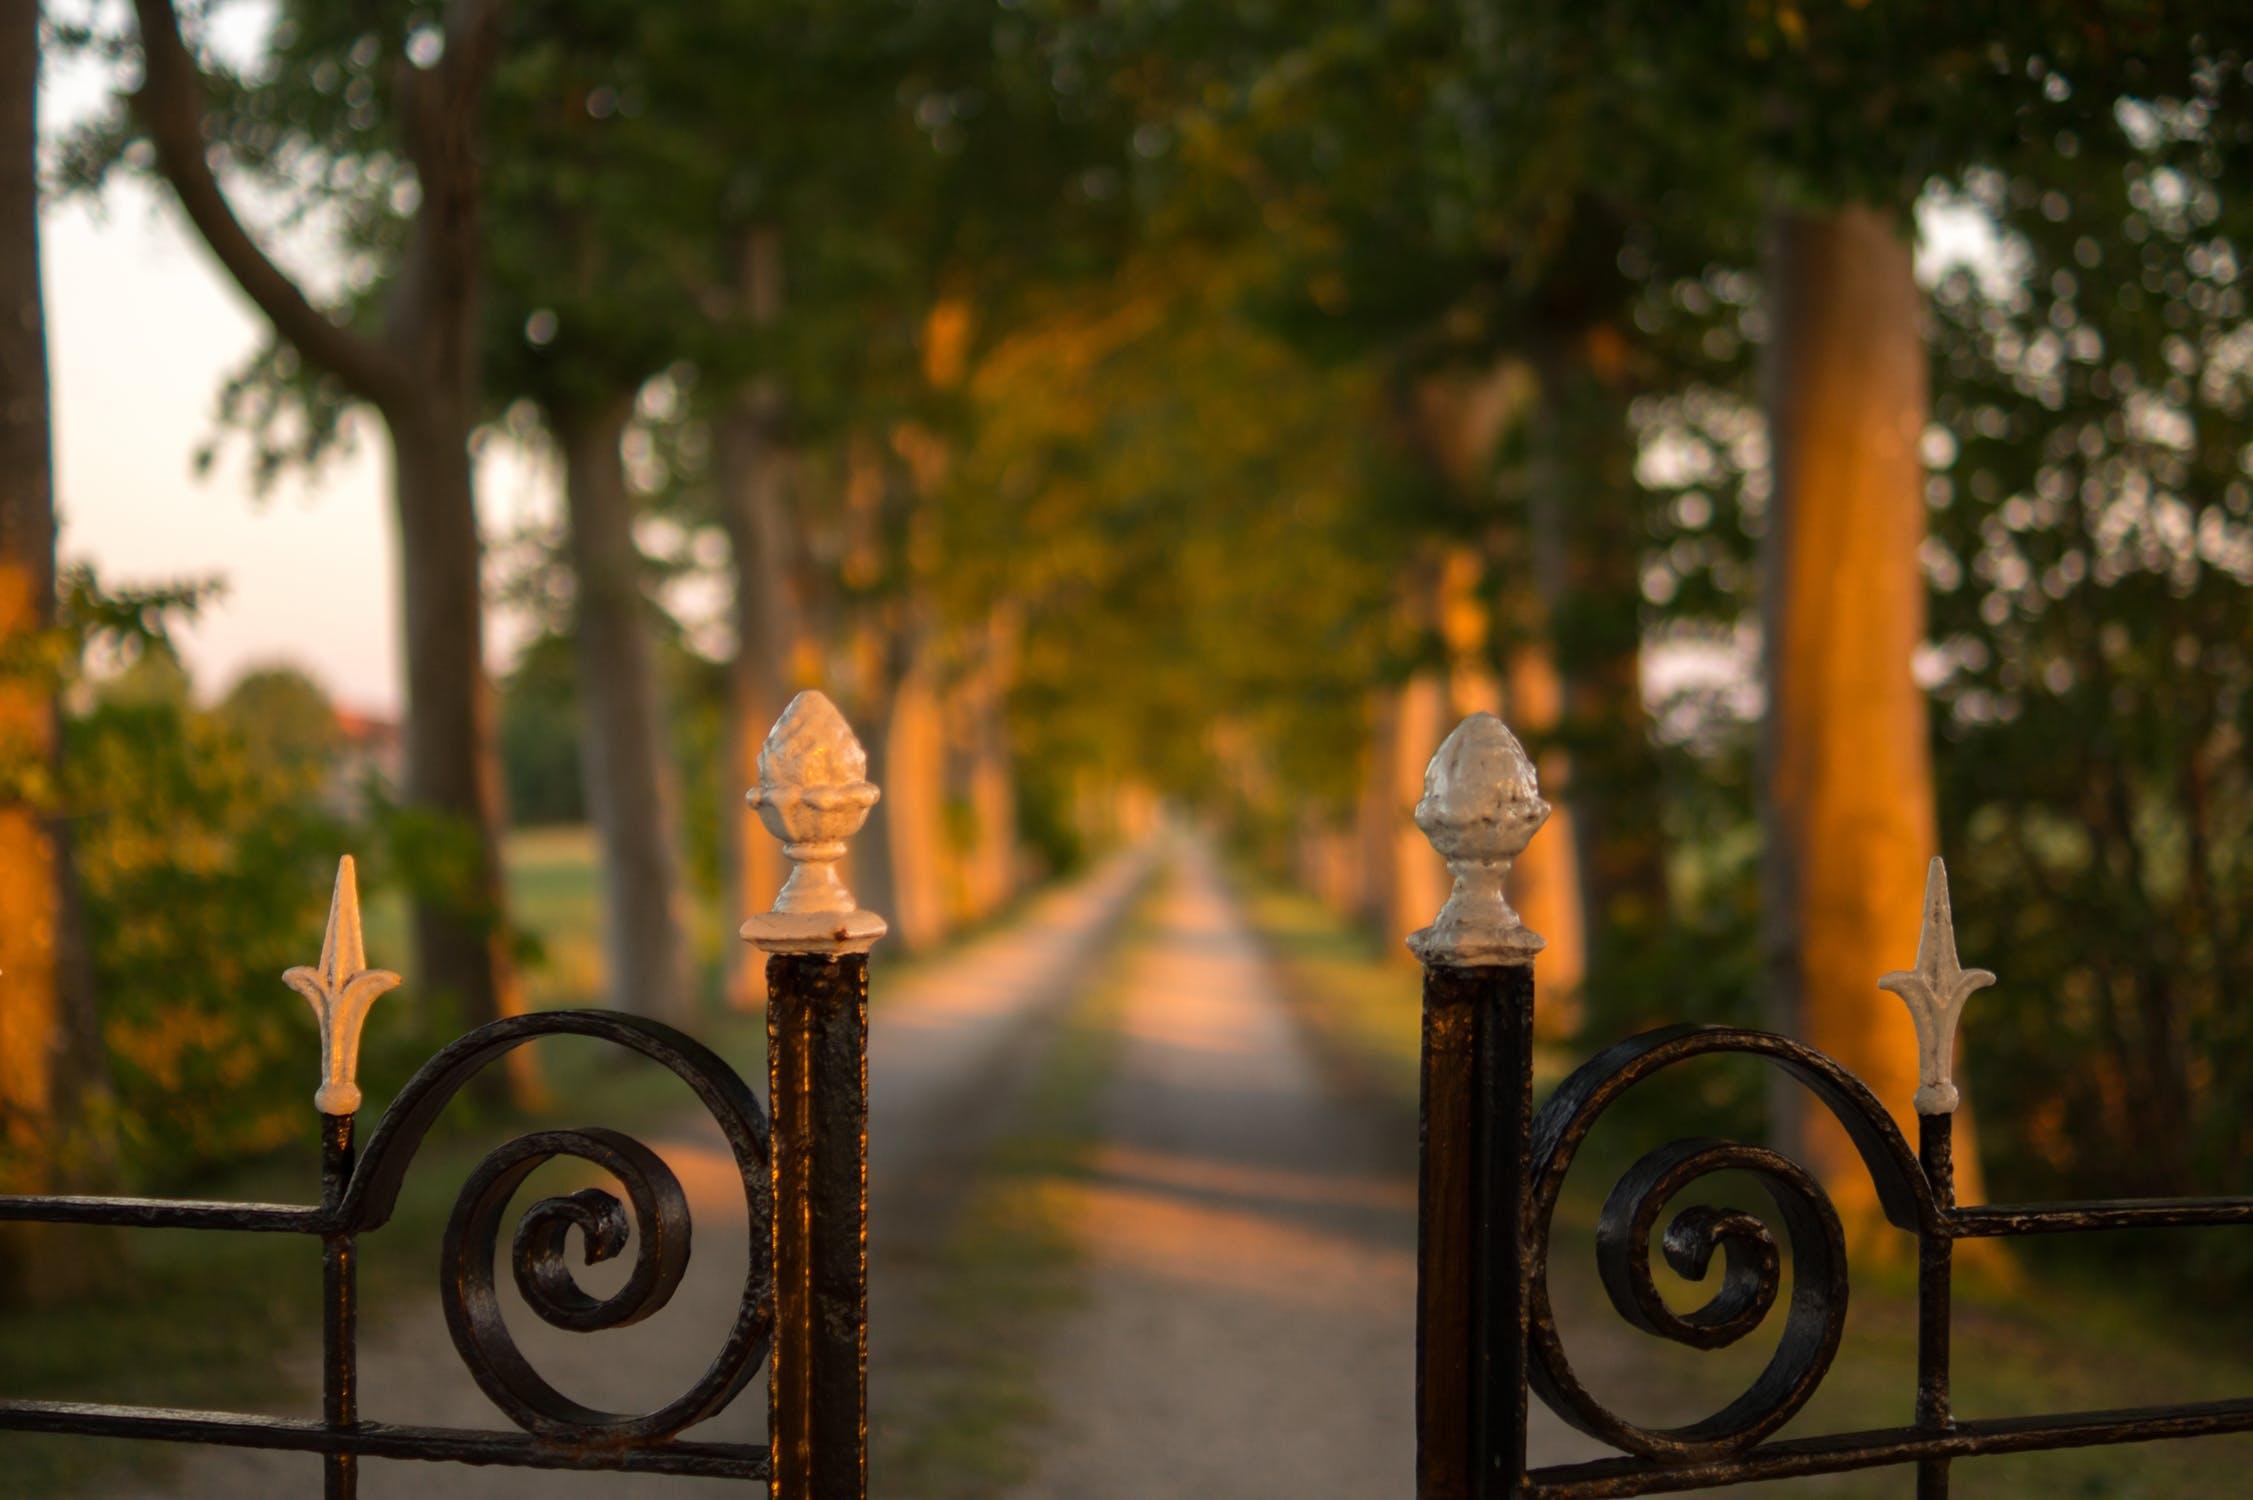 cast-iron fence